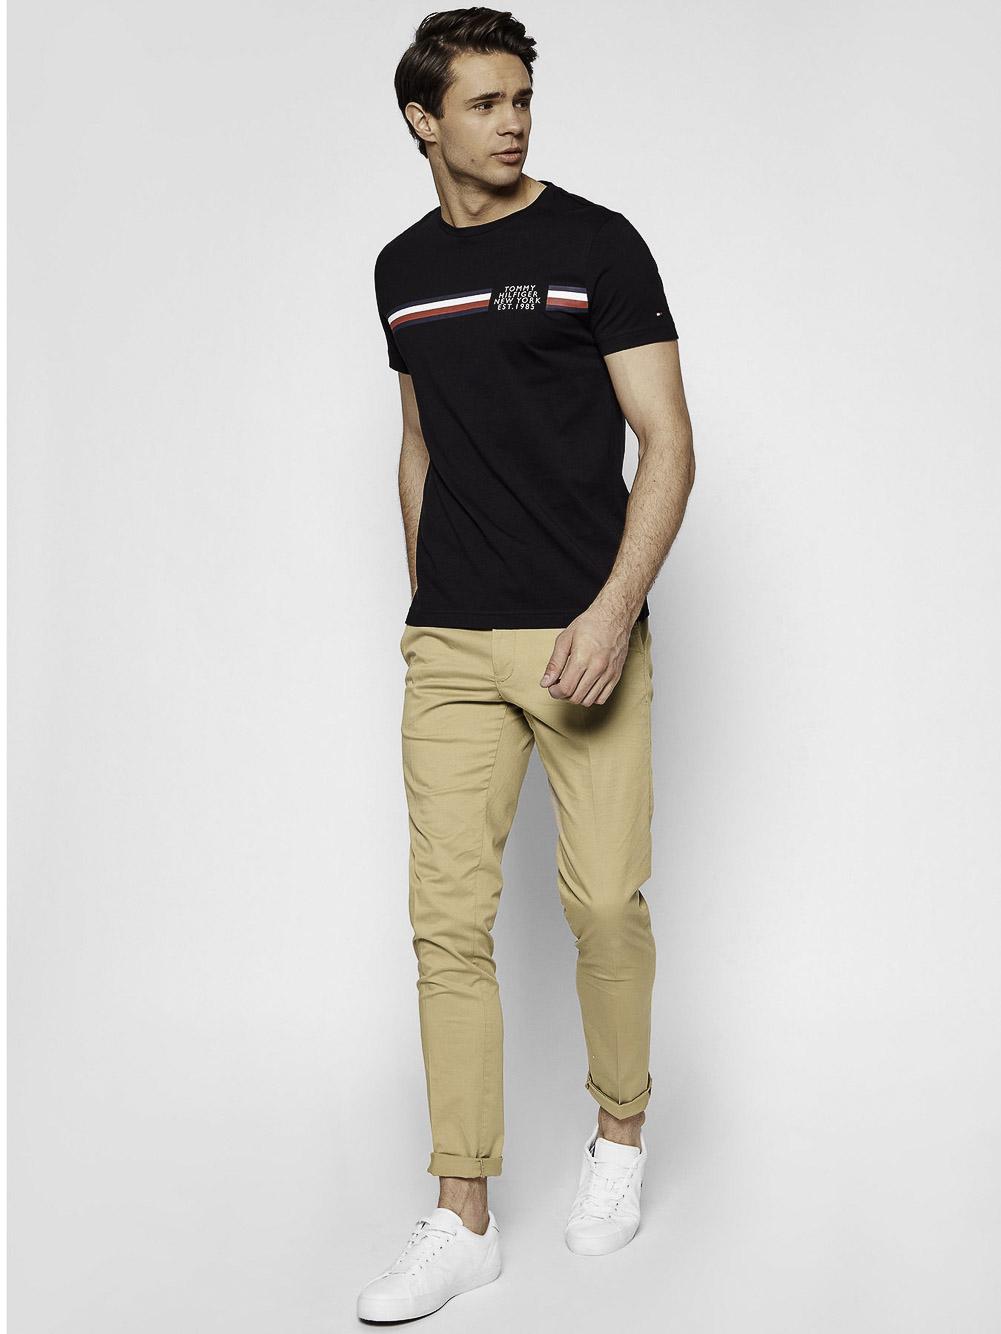 TOMMY HILFIGER Μπλούζα t-shirt MW0MW16592 ΜΑΥΡΟ